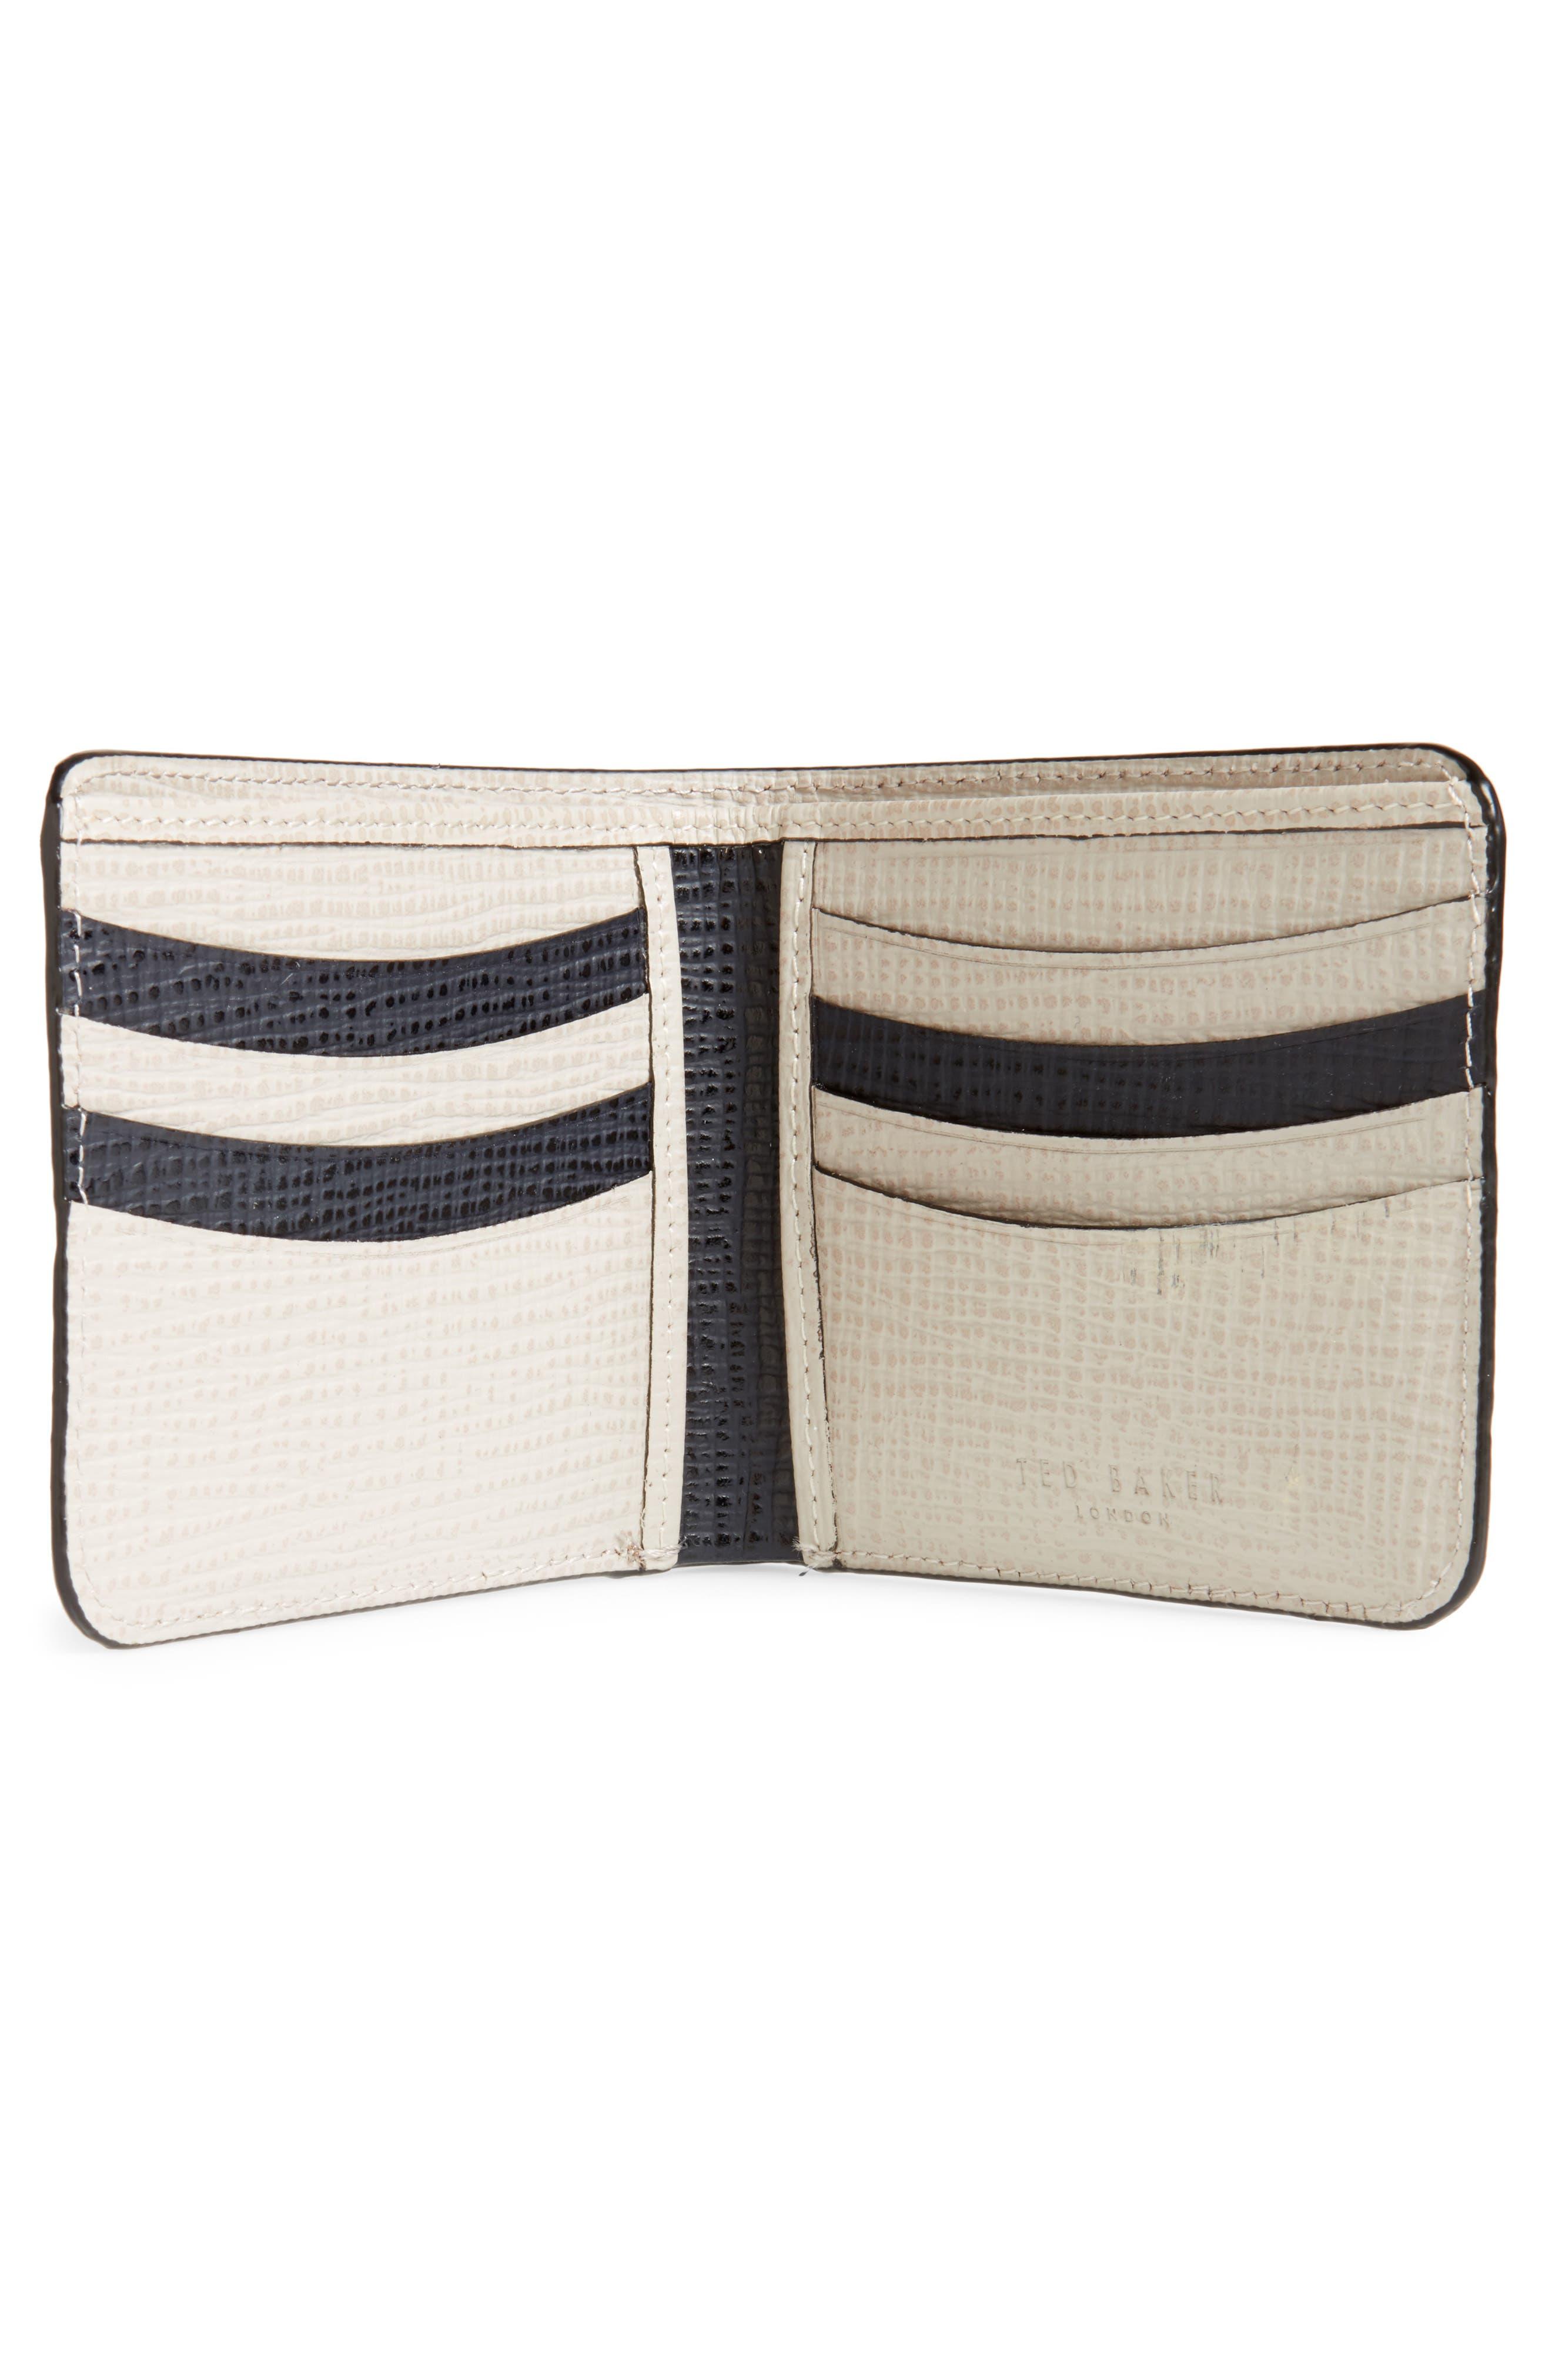 Astridd Palmelato Leather Wallet,                             Alternate thumbnail 2, color,                             200